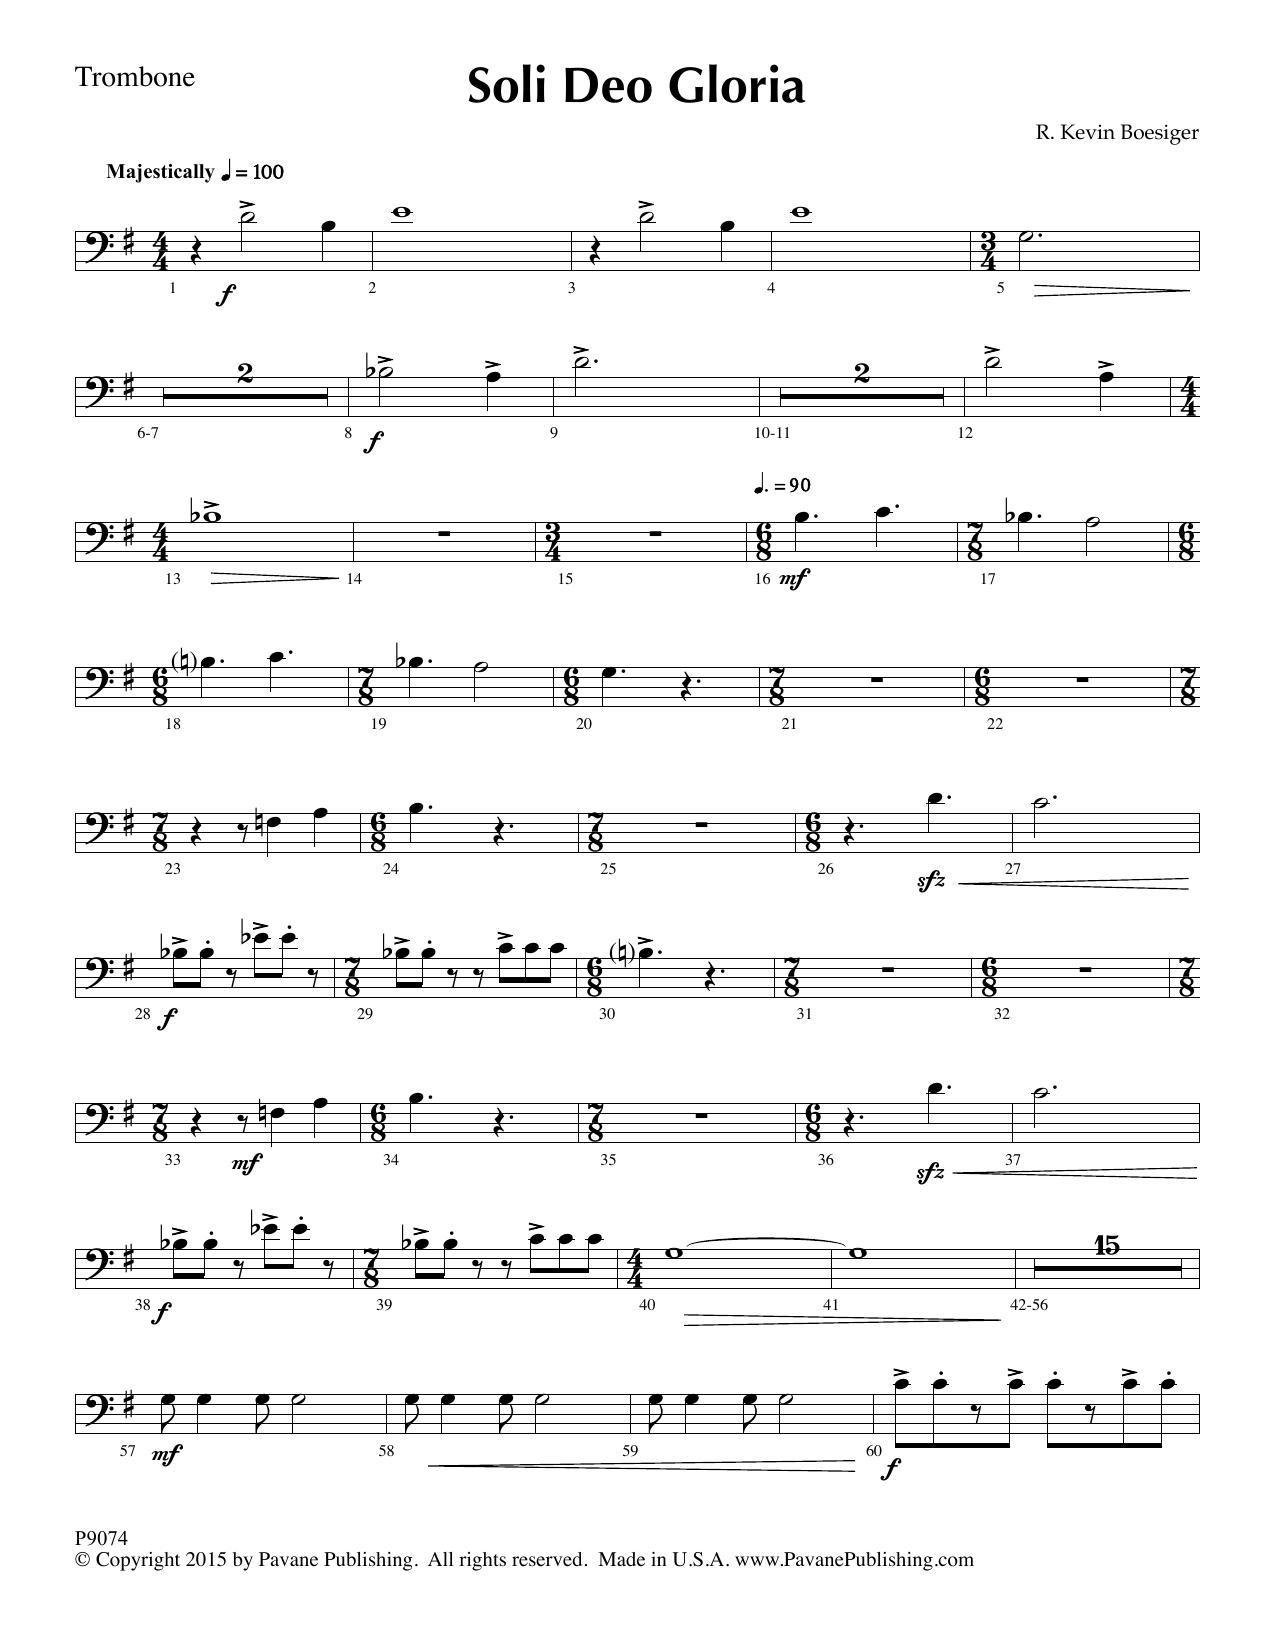 Soli Deo Gloria - Trombone Sheet Music